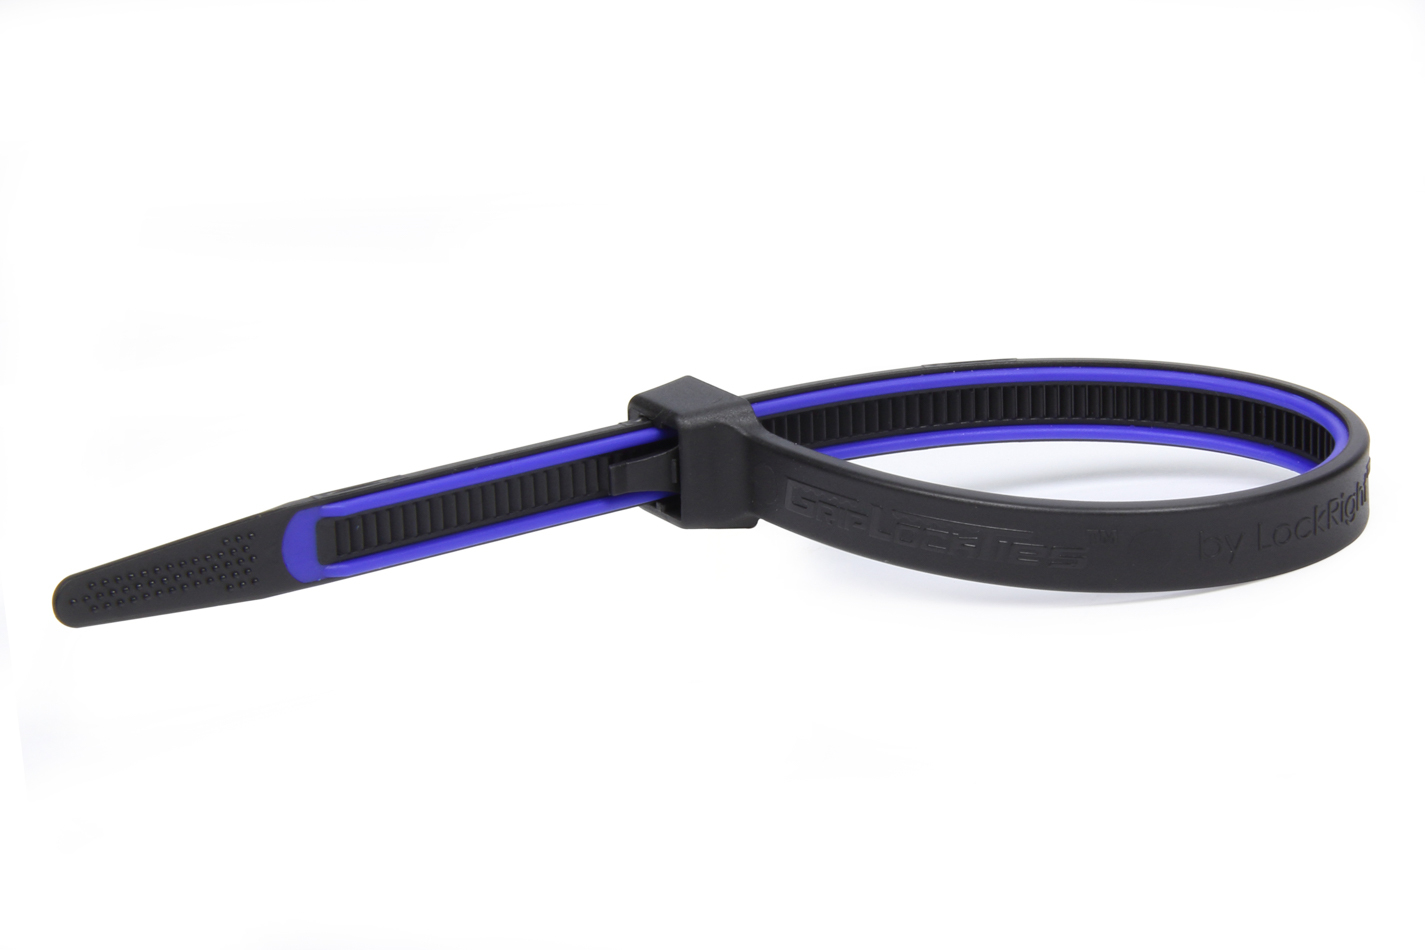 Grip Lock Ties 2908BKBUHB40 Cable Ties, Zip Ties, 8 in Long, Blue Rubber Lined, Nylon, Black, Reusable, Set of 40